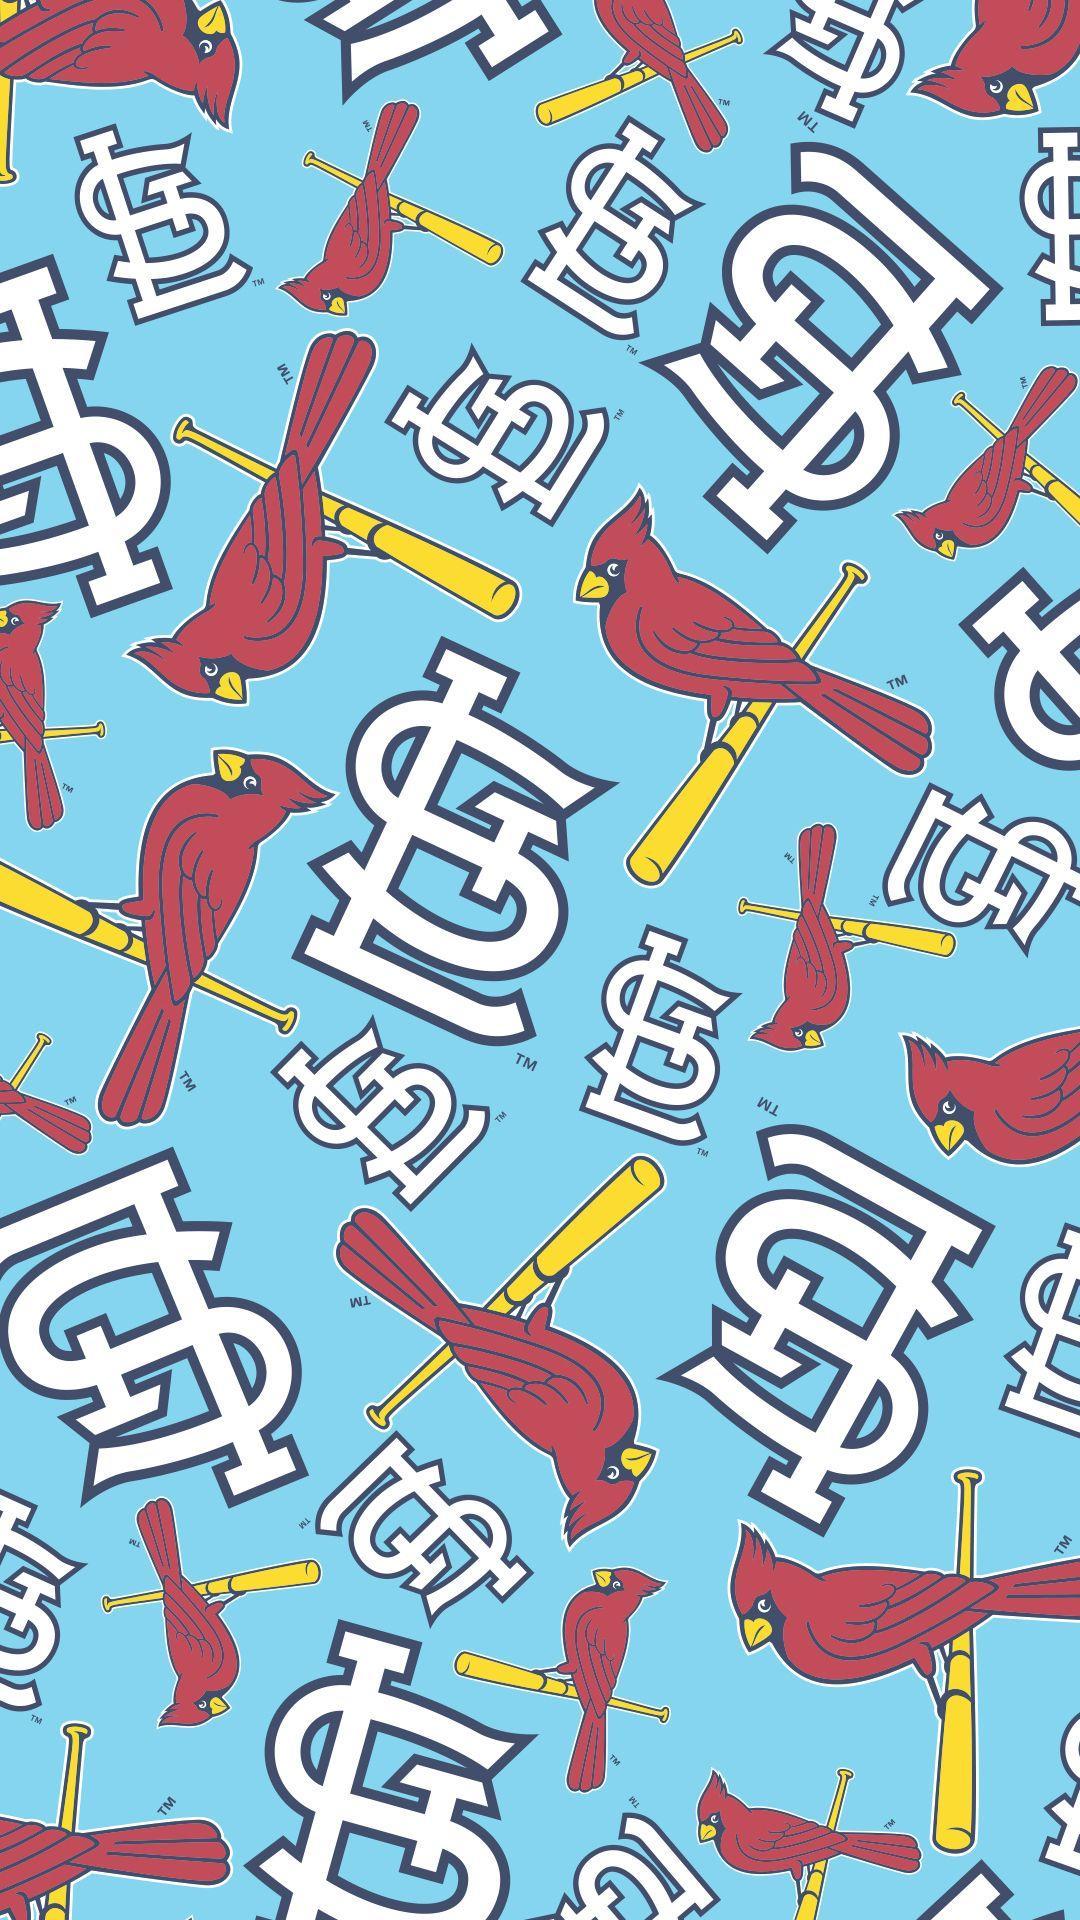 St. Louis Cardinals 2019 Wallpapers - Wallpaper Cave